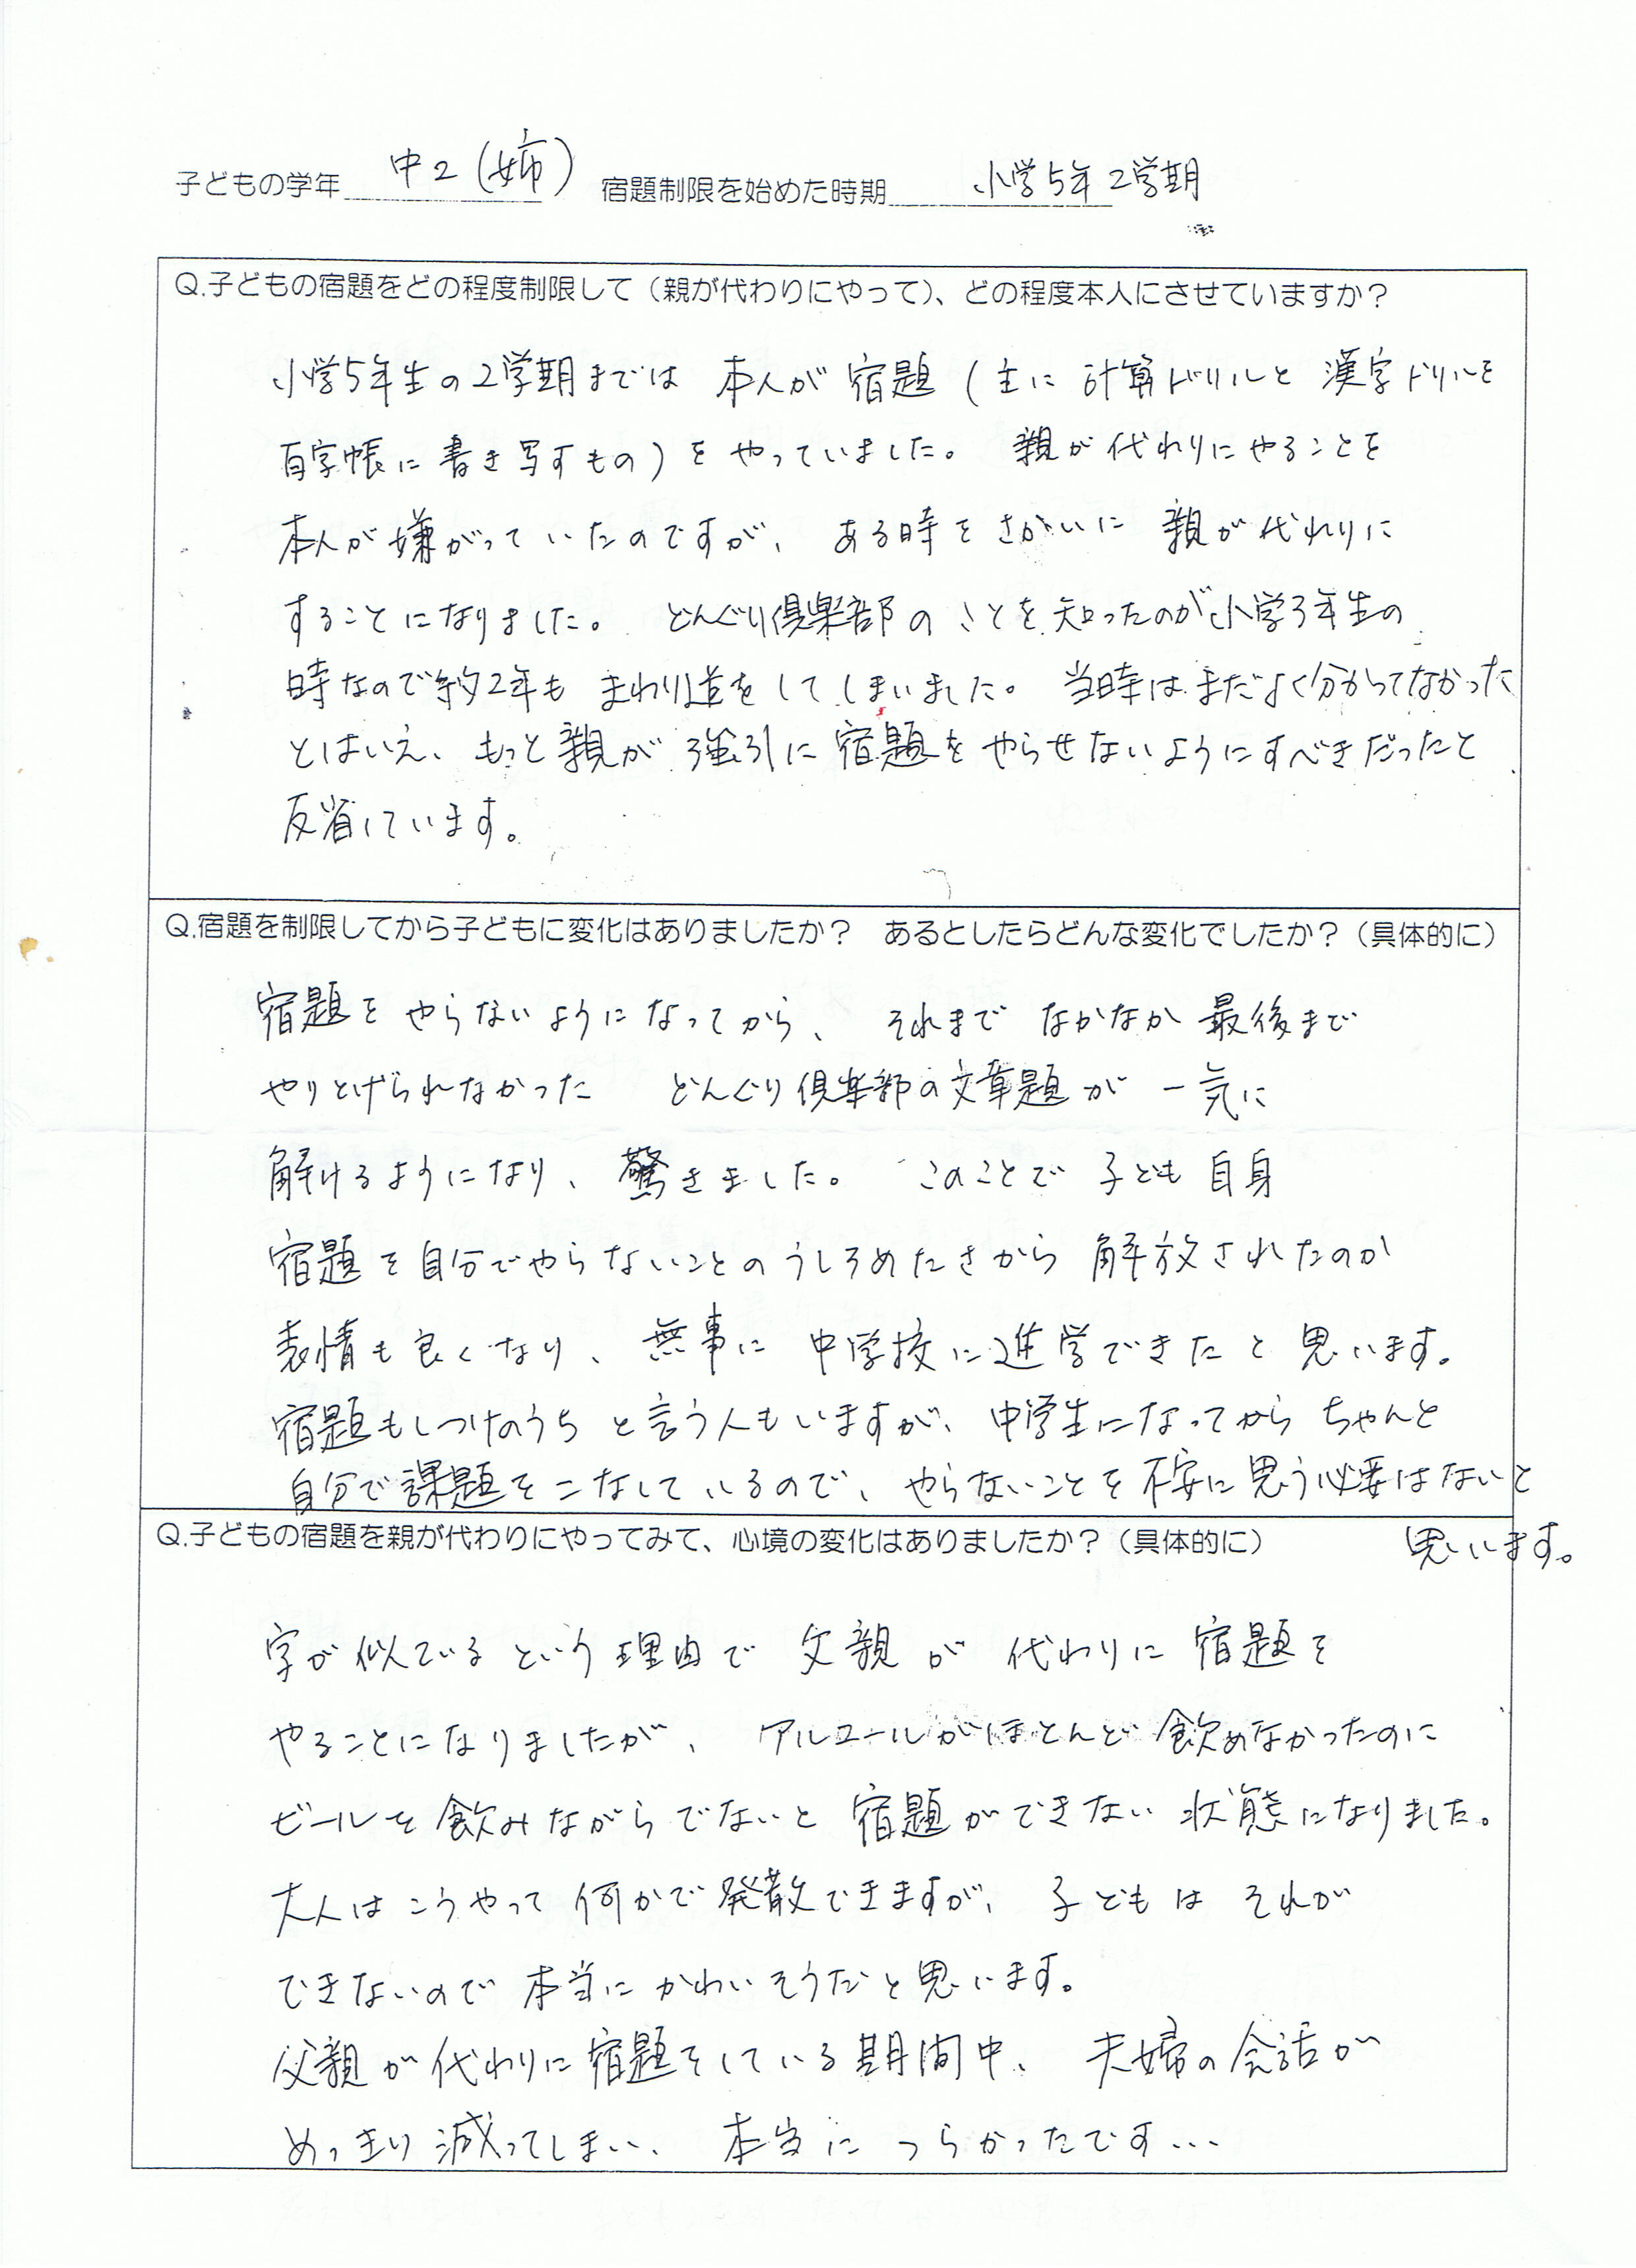 CCF20151212_00001.jpg